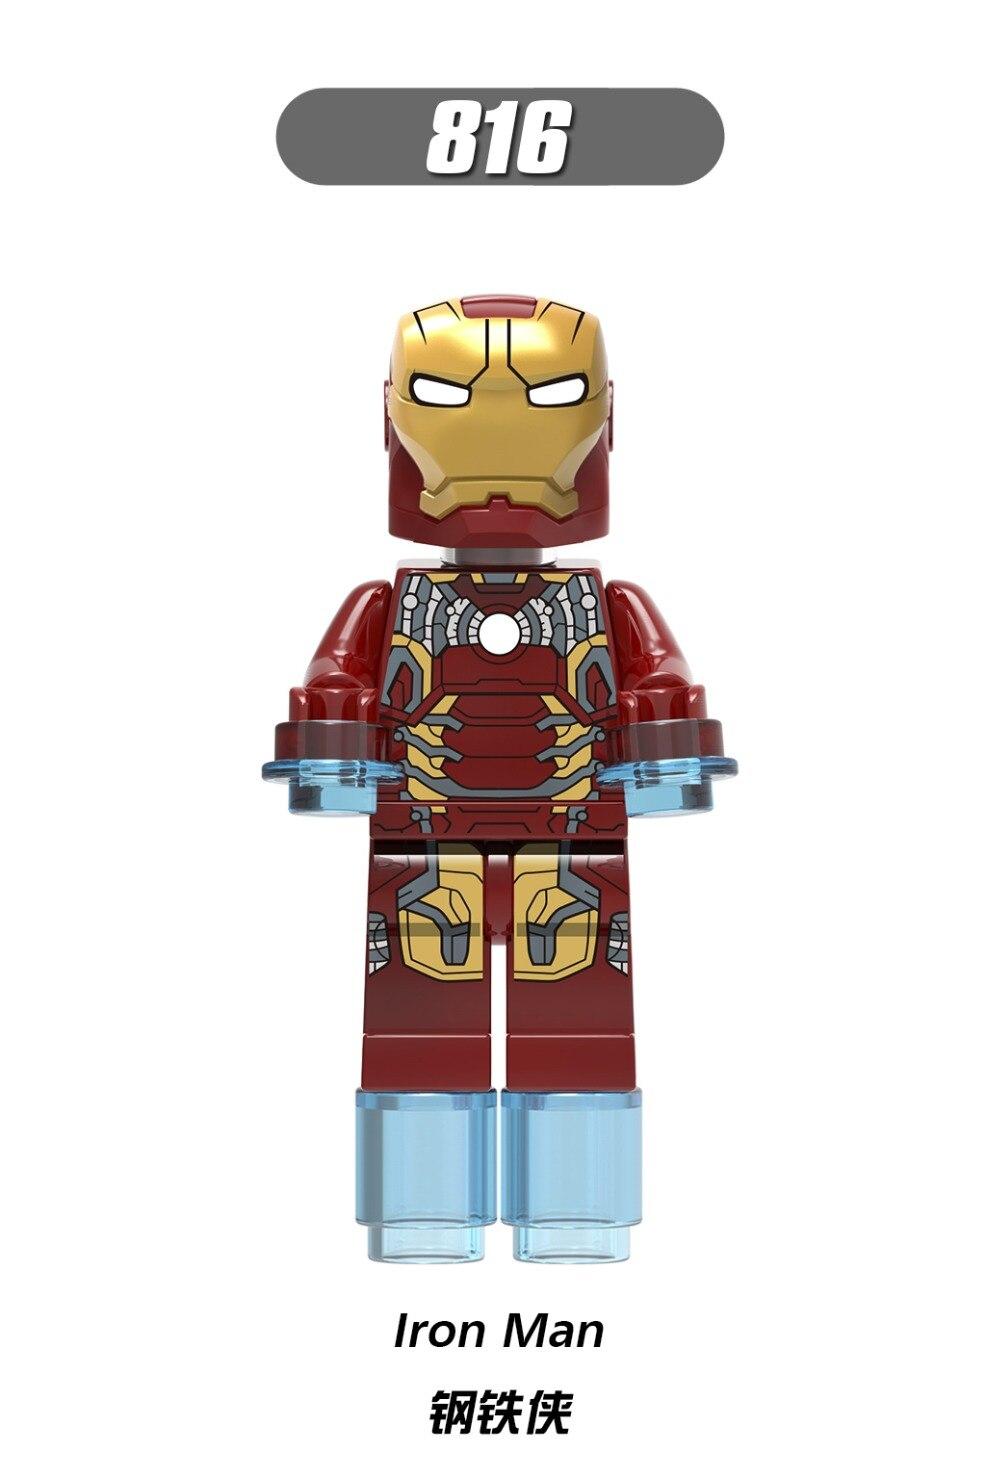 816 Legoing Marvel Super Héros Iron Man Figures Thanos Blocs Brique Infinity War Avengers Blocs De Construction Briques Jouets Legoings